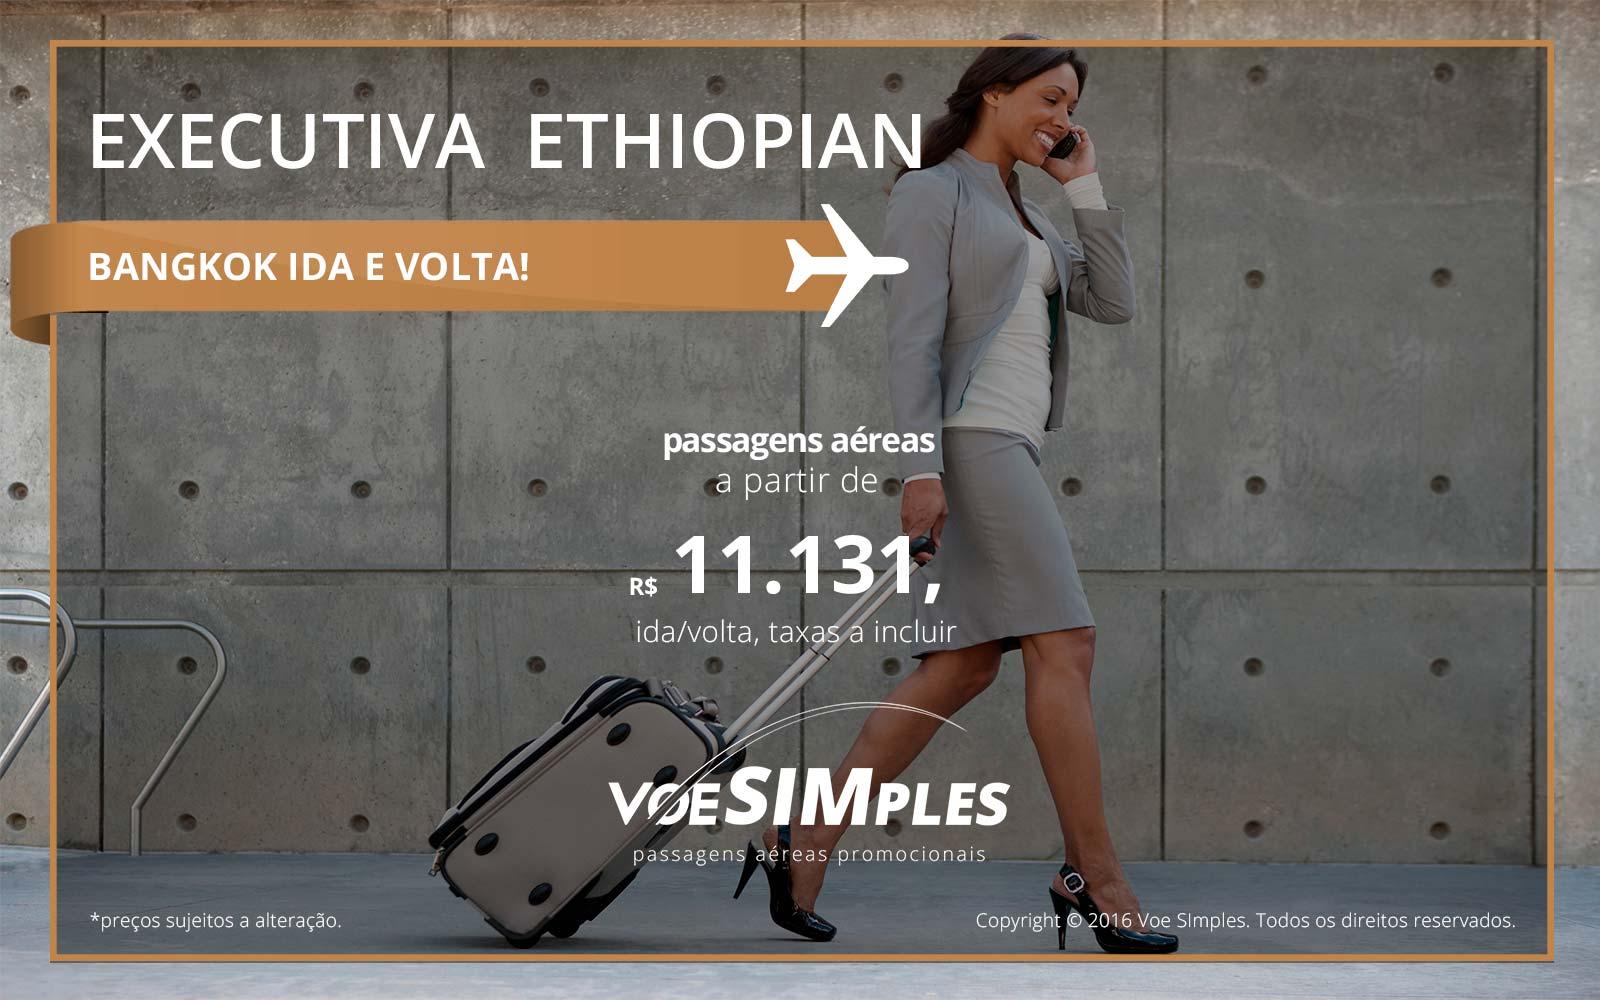 Passagem aérea Classe Executiva Ethiopian Airlines para Bangkok